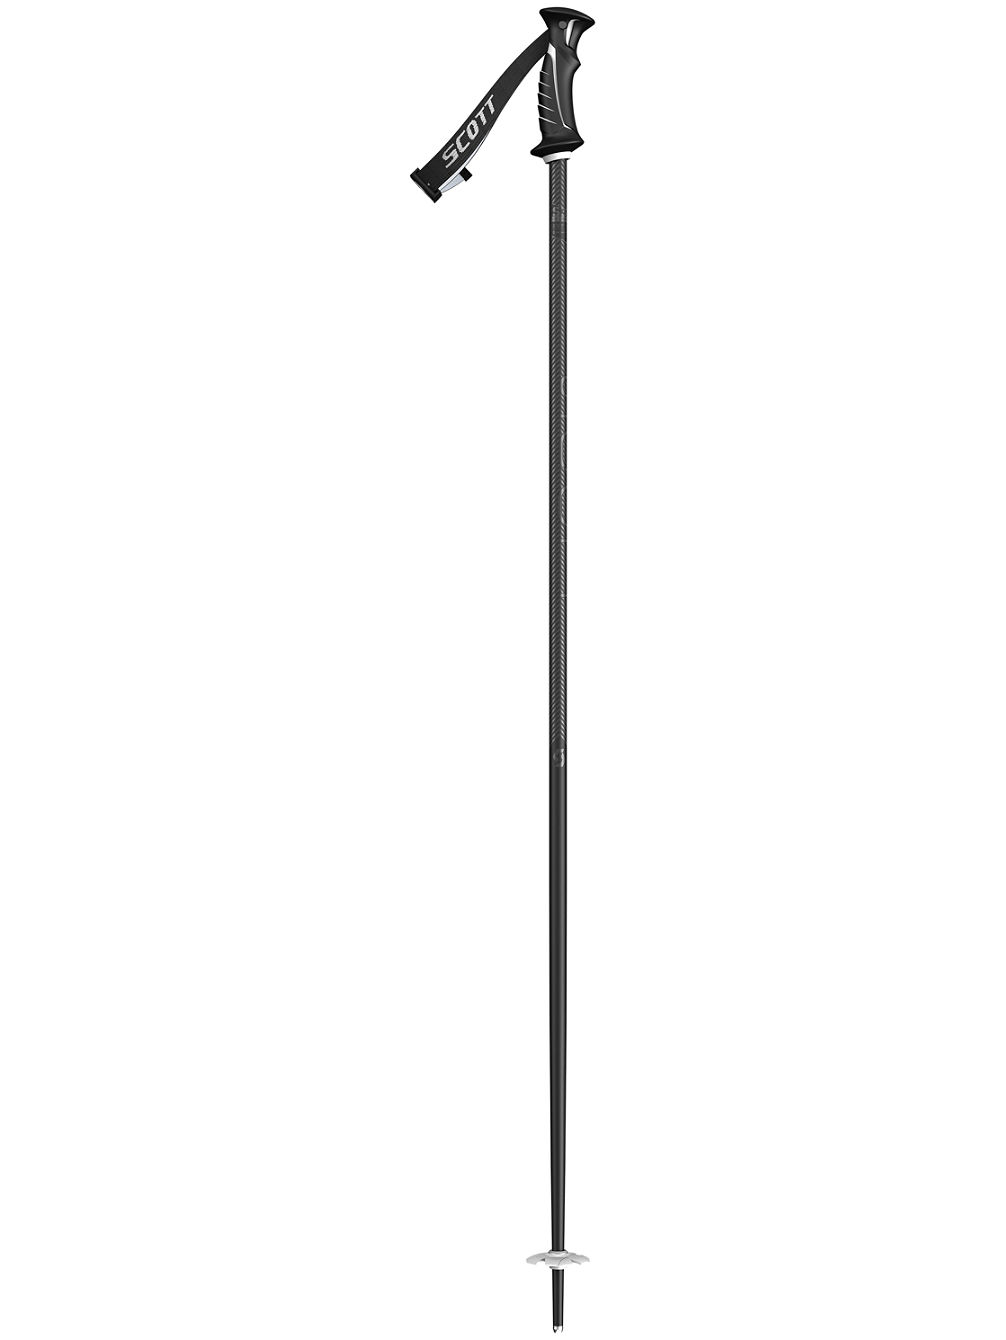 Mj 105 2020